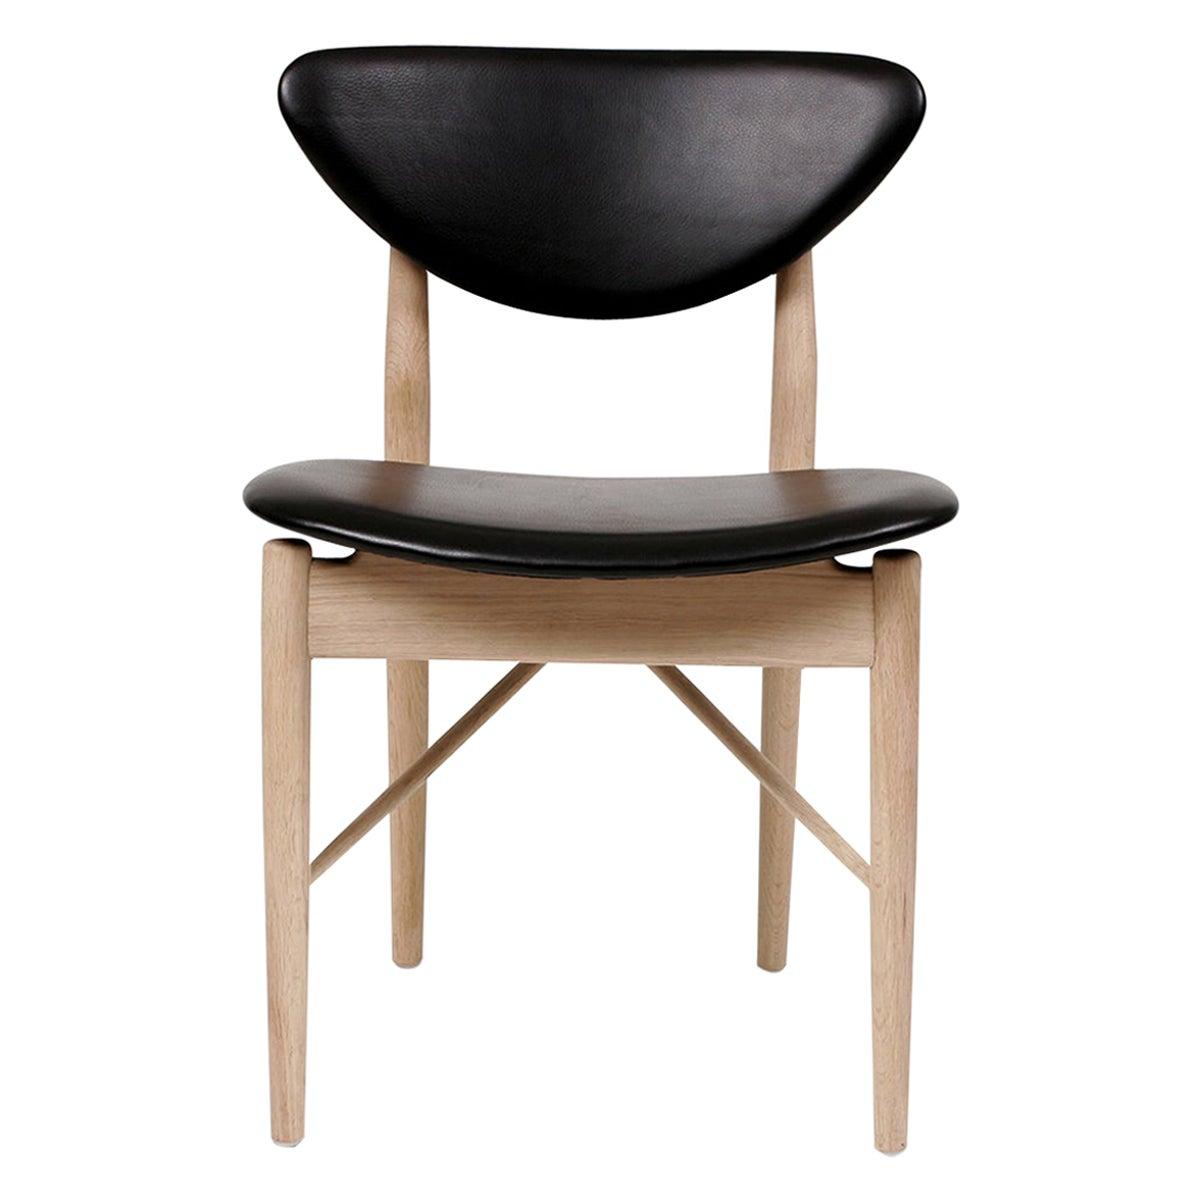 Finn Juhl 108 Chair, Wood and Leather by House of Finn Juhl